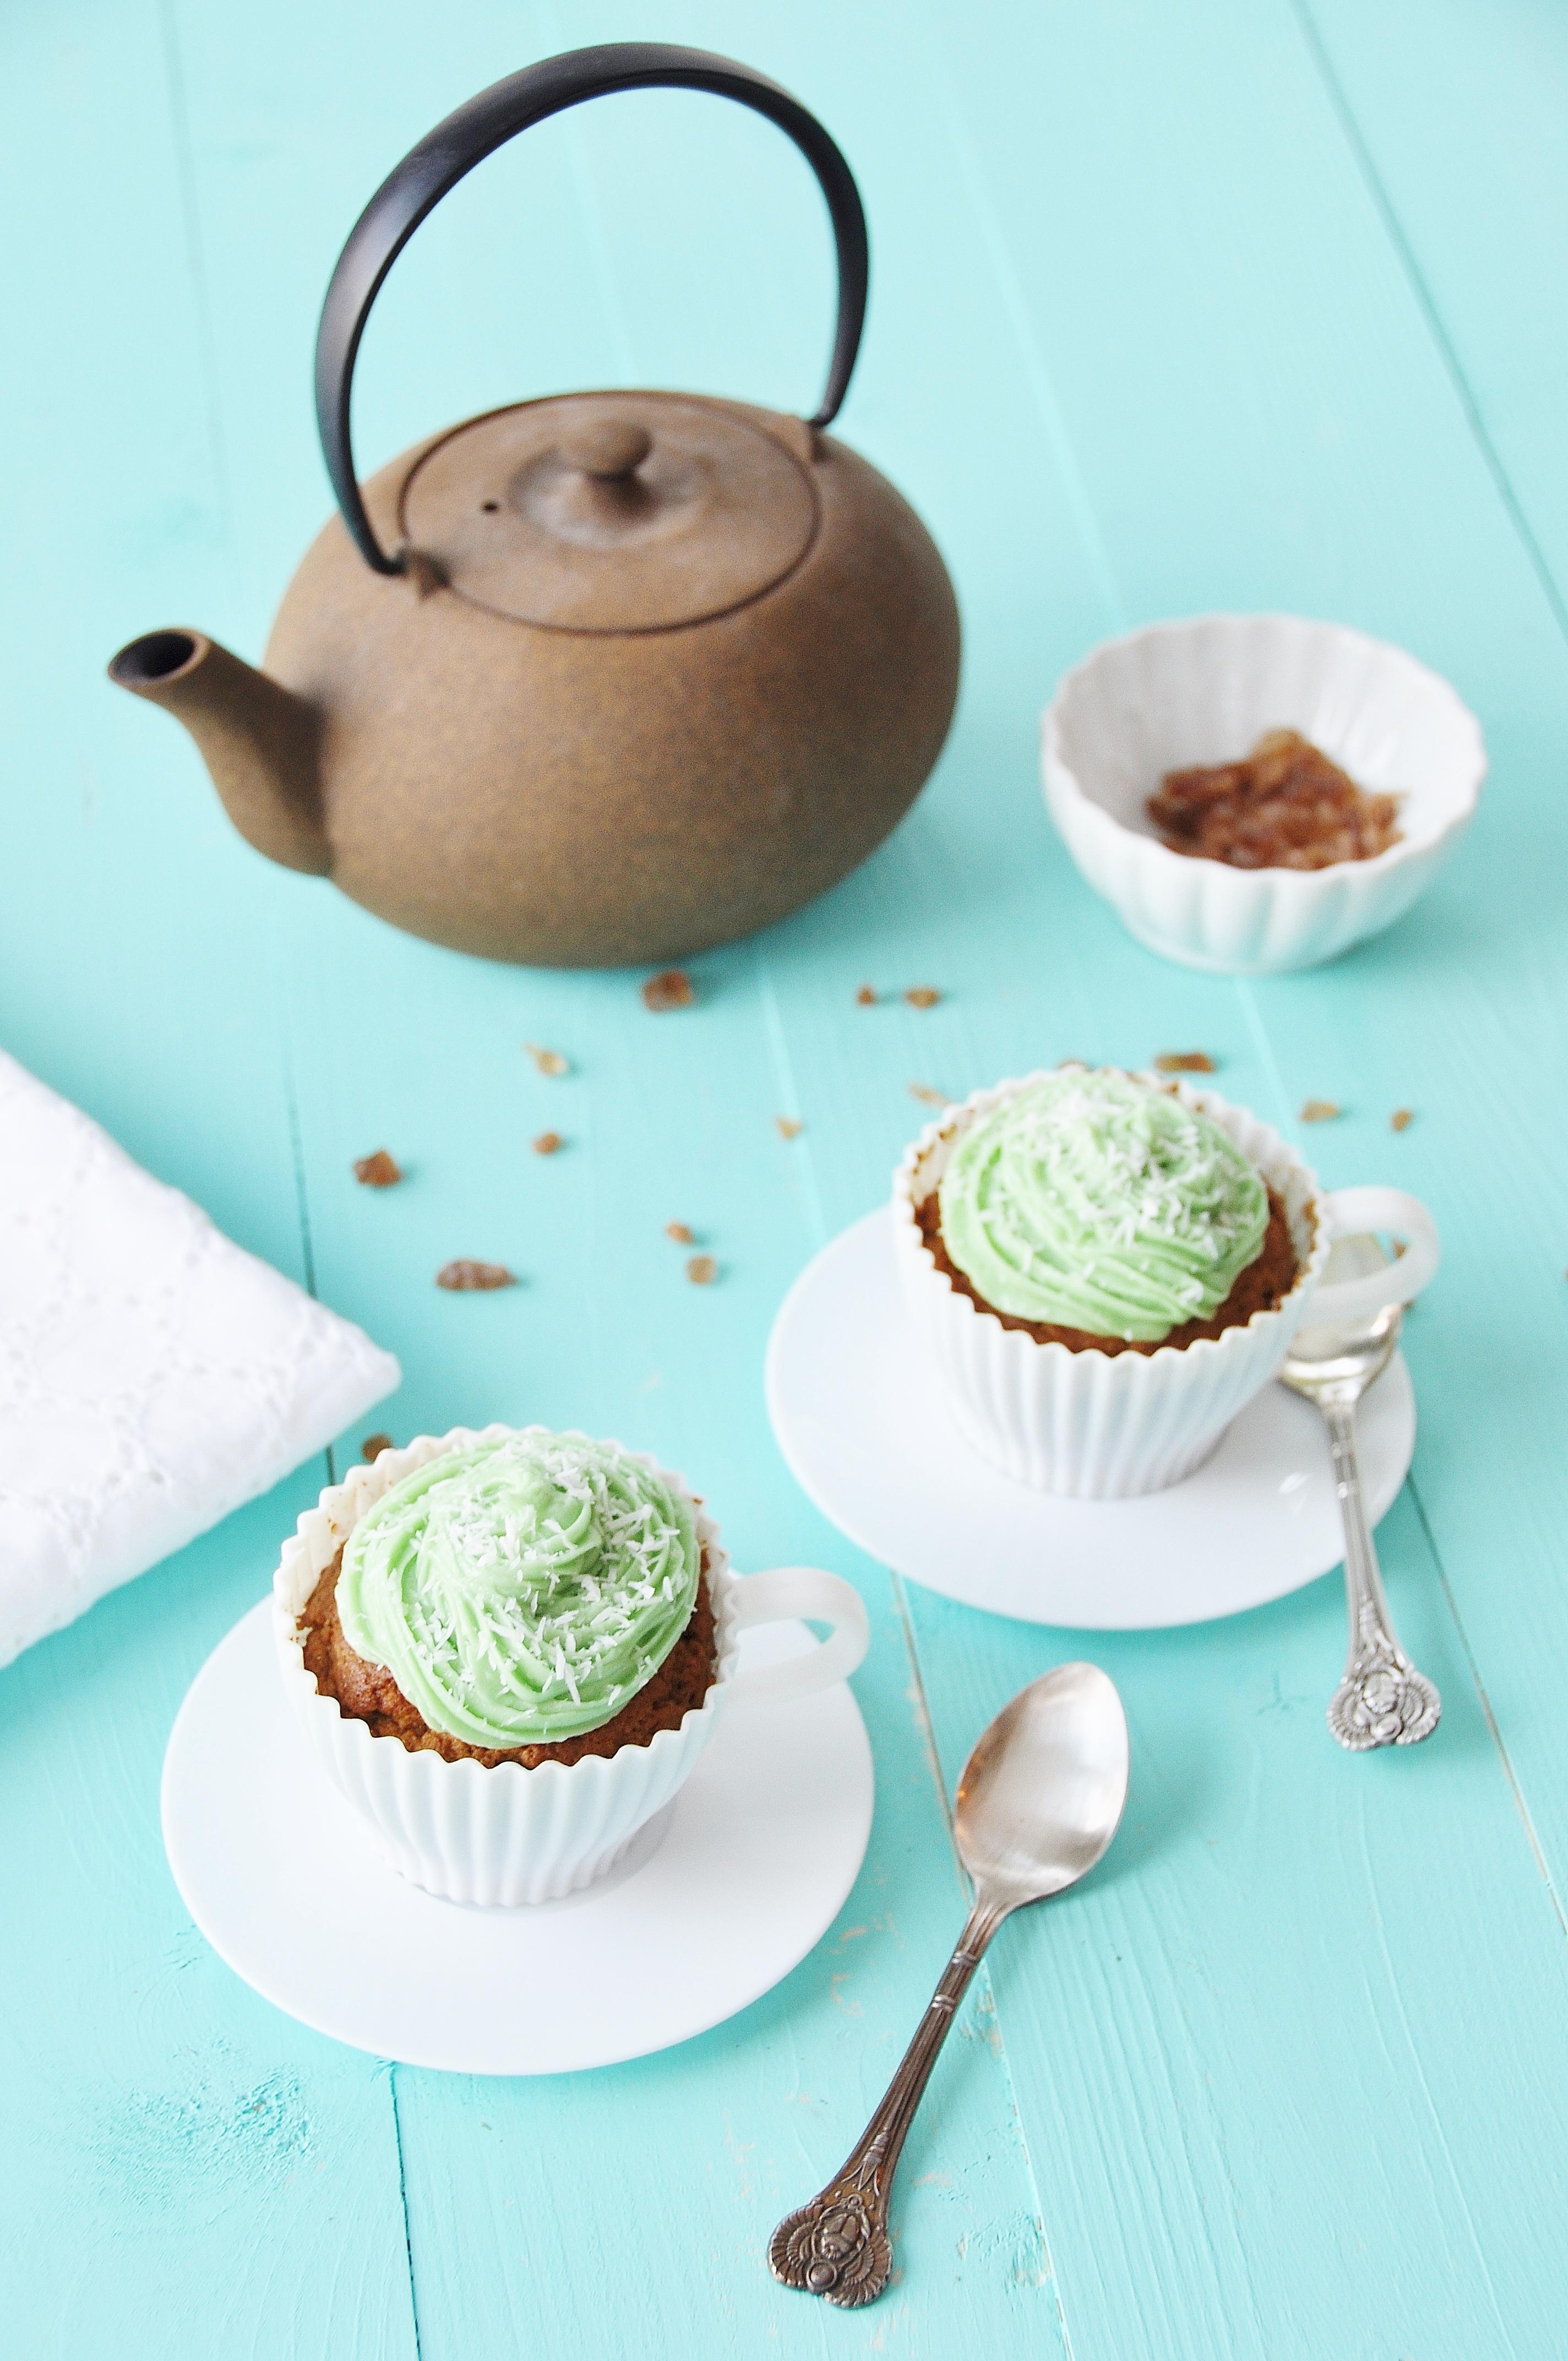 how to make a cup of matcha tea